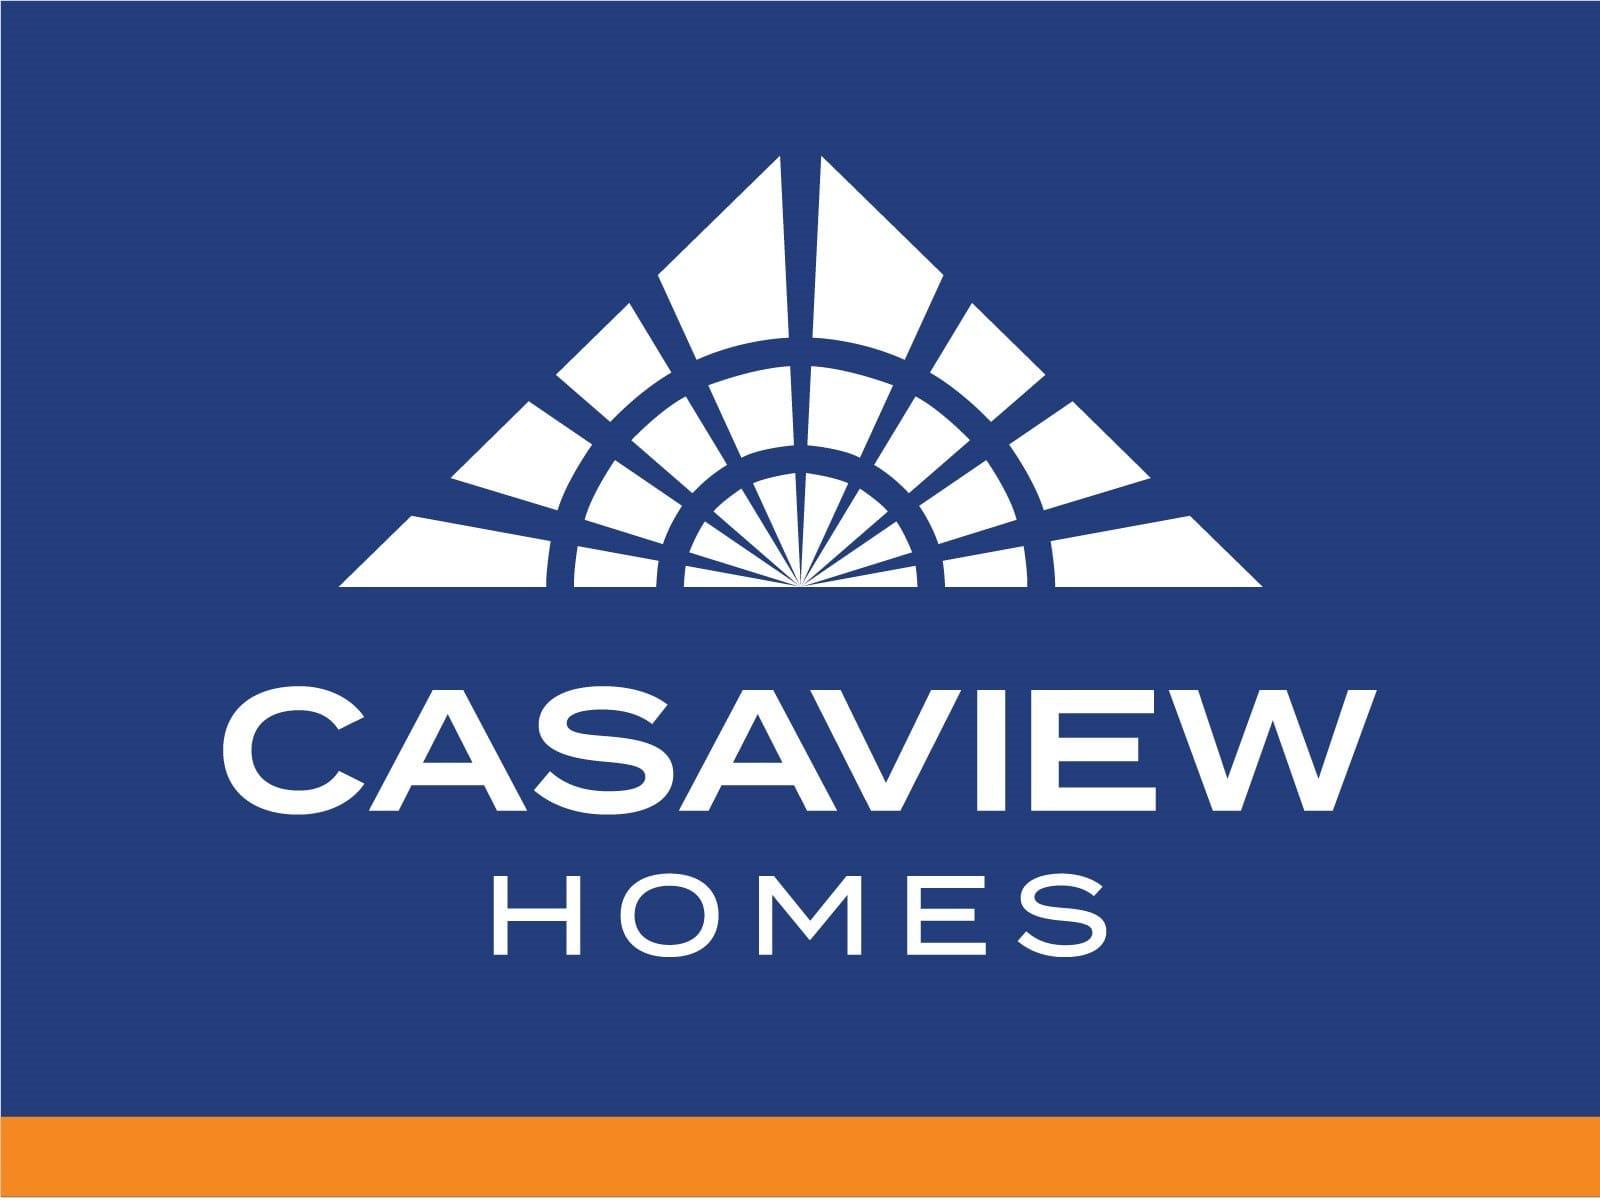 Property Lot 635 Mare St -  Futurity Rise Estate, Box Hill NSW 2765 secondary IMAGE